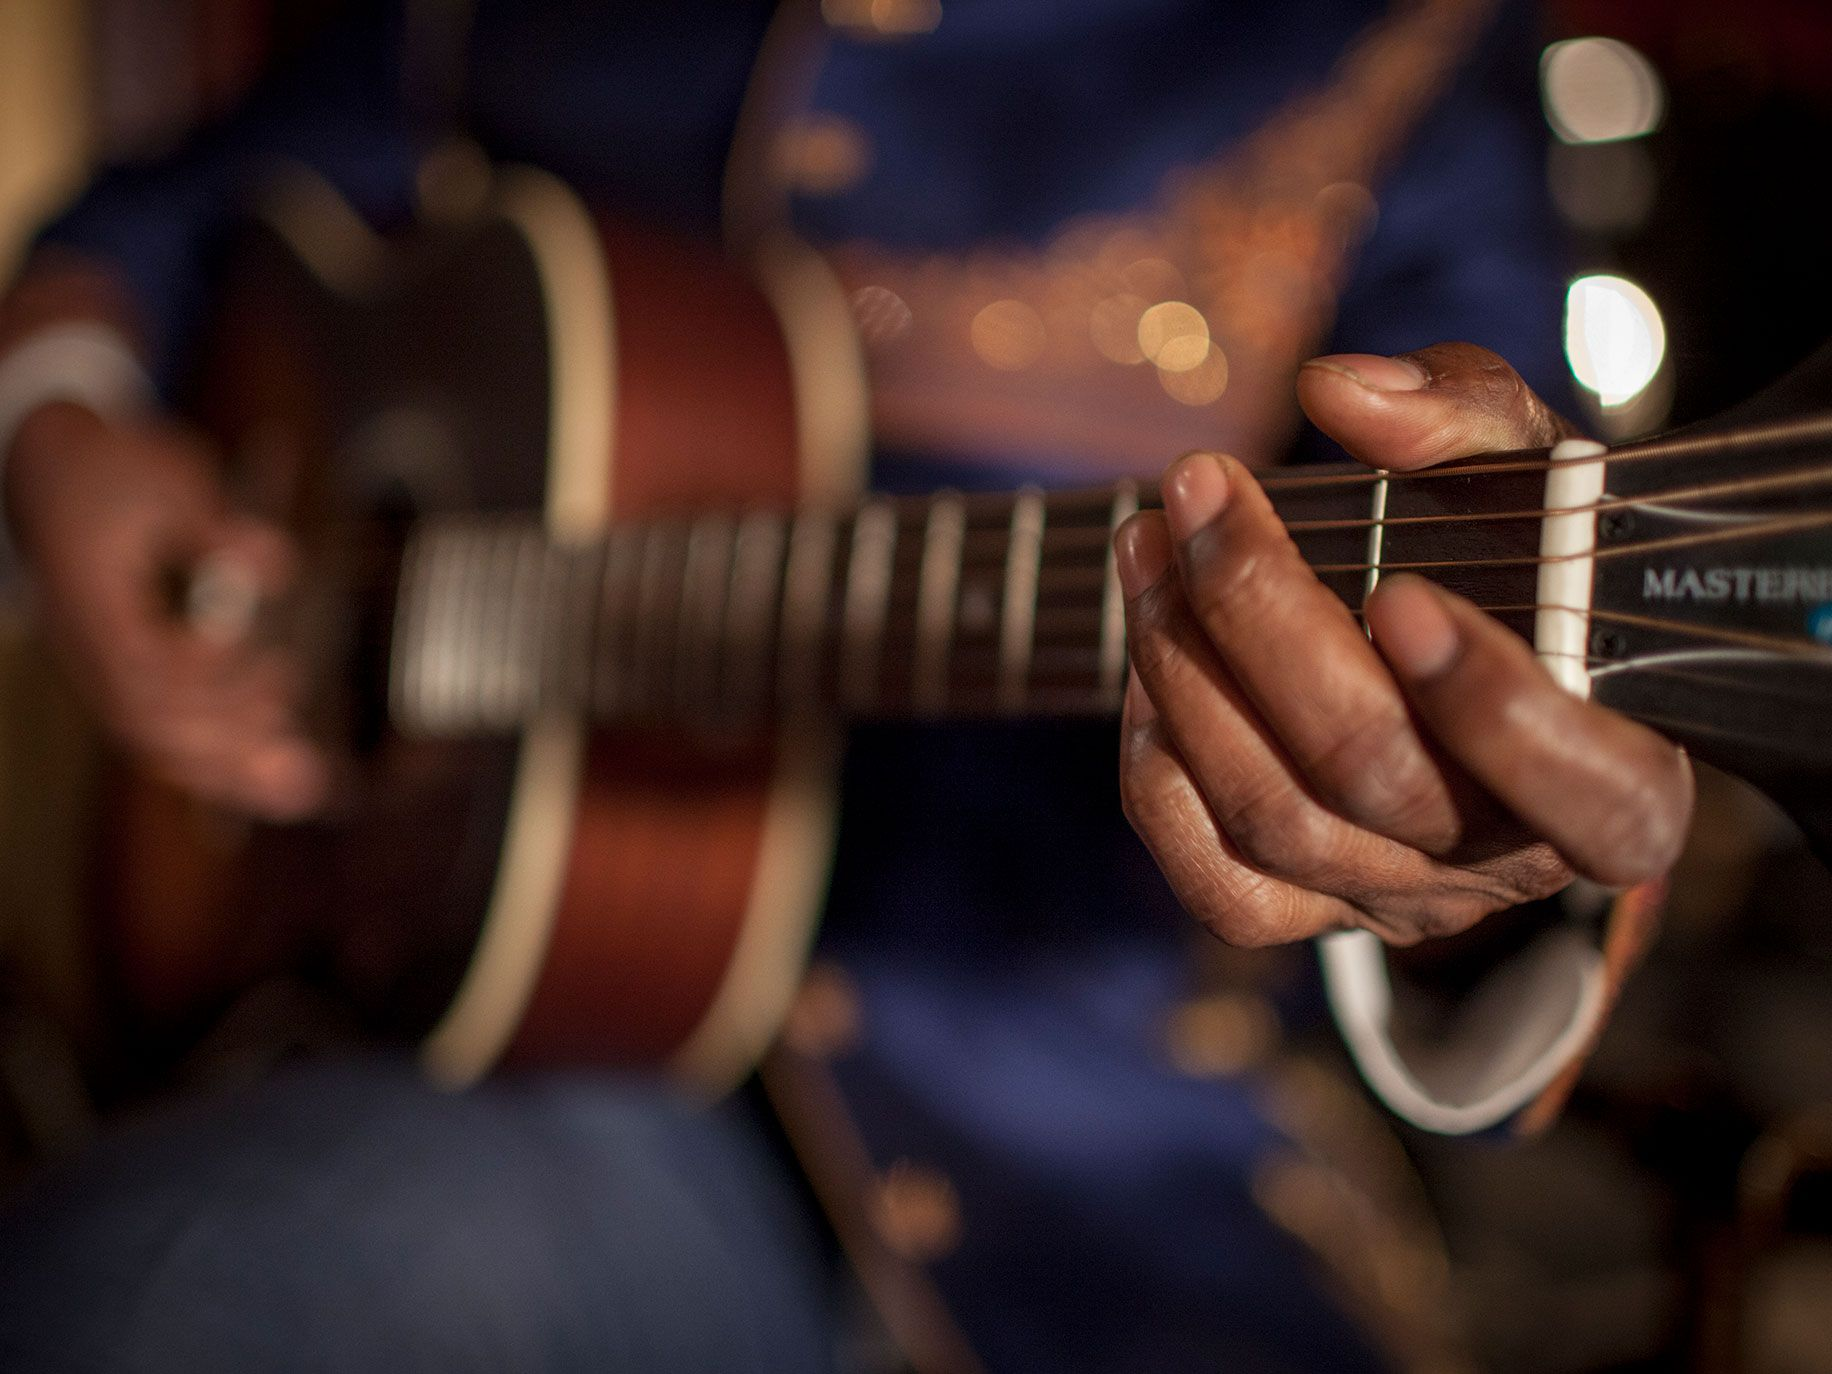 This photo shows Fantastic Negrito playing his guitar at The Fillmore in San Francisco.